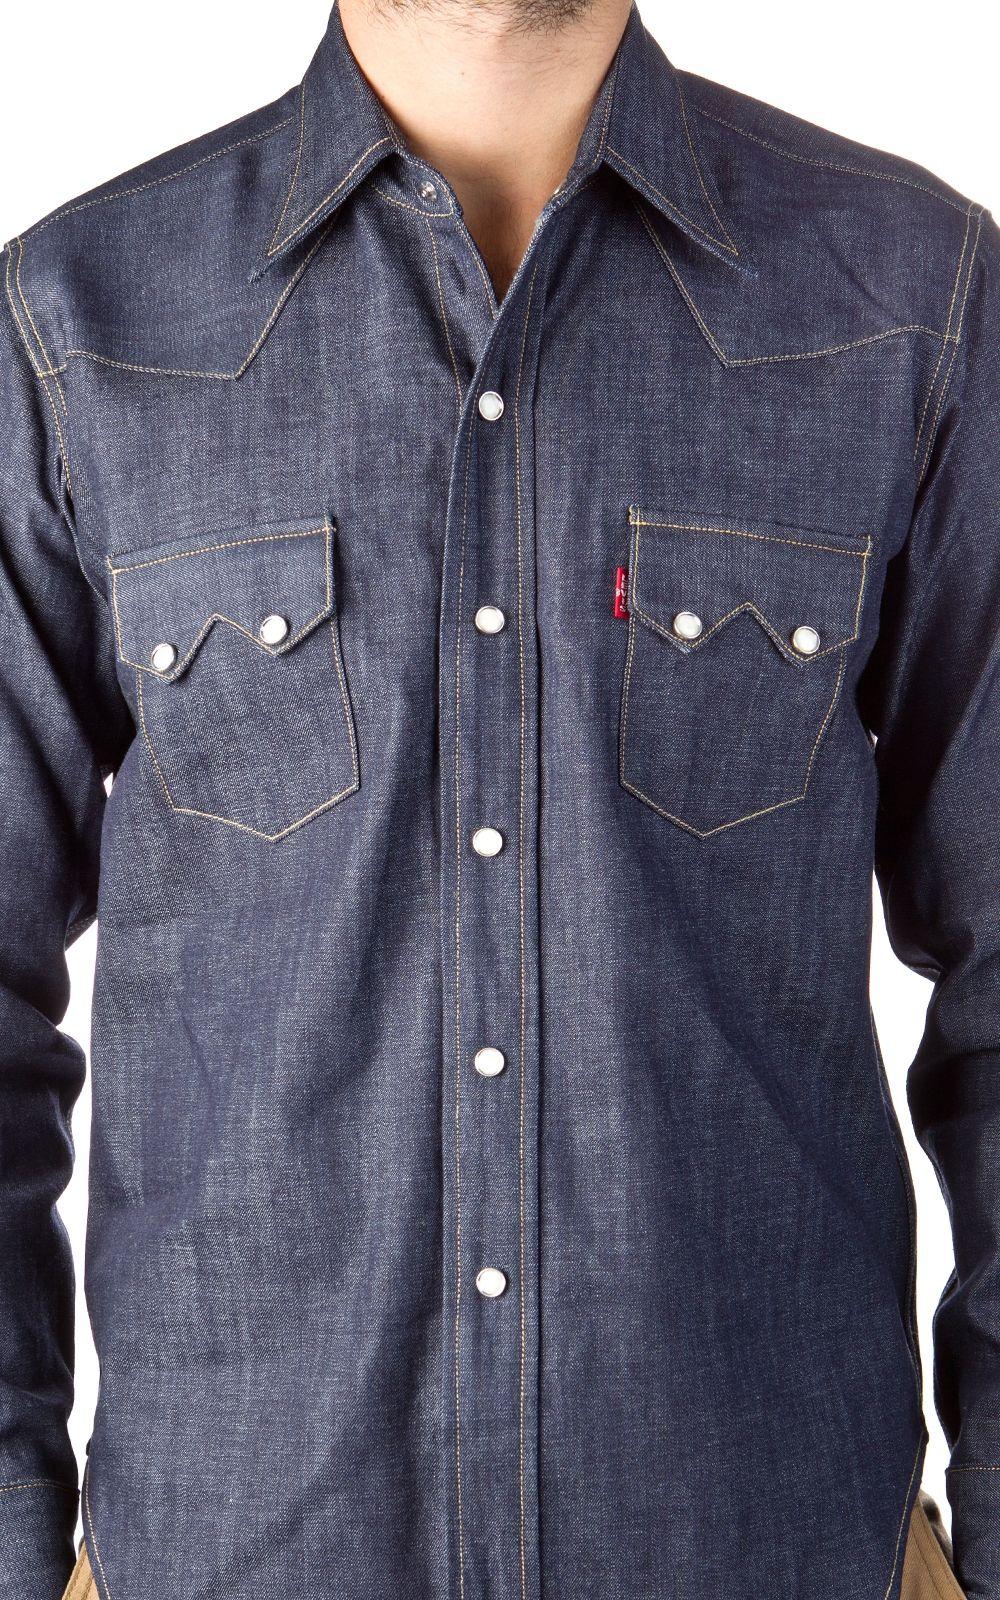 3738778a7c Levi s® Vintage Clothing 1955 Sawtooth Denim Shirt Rigid